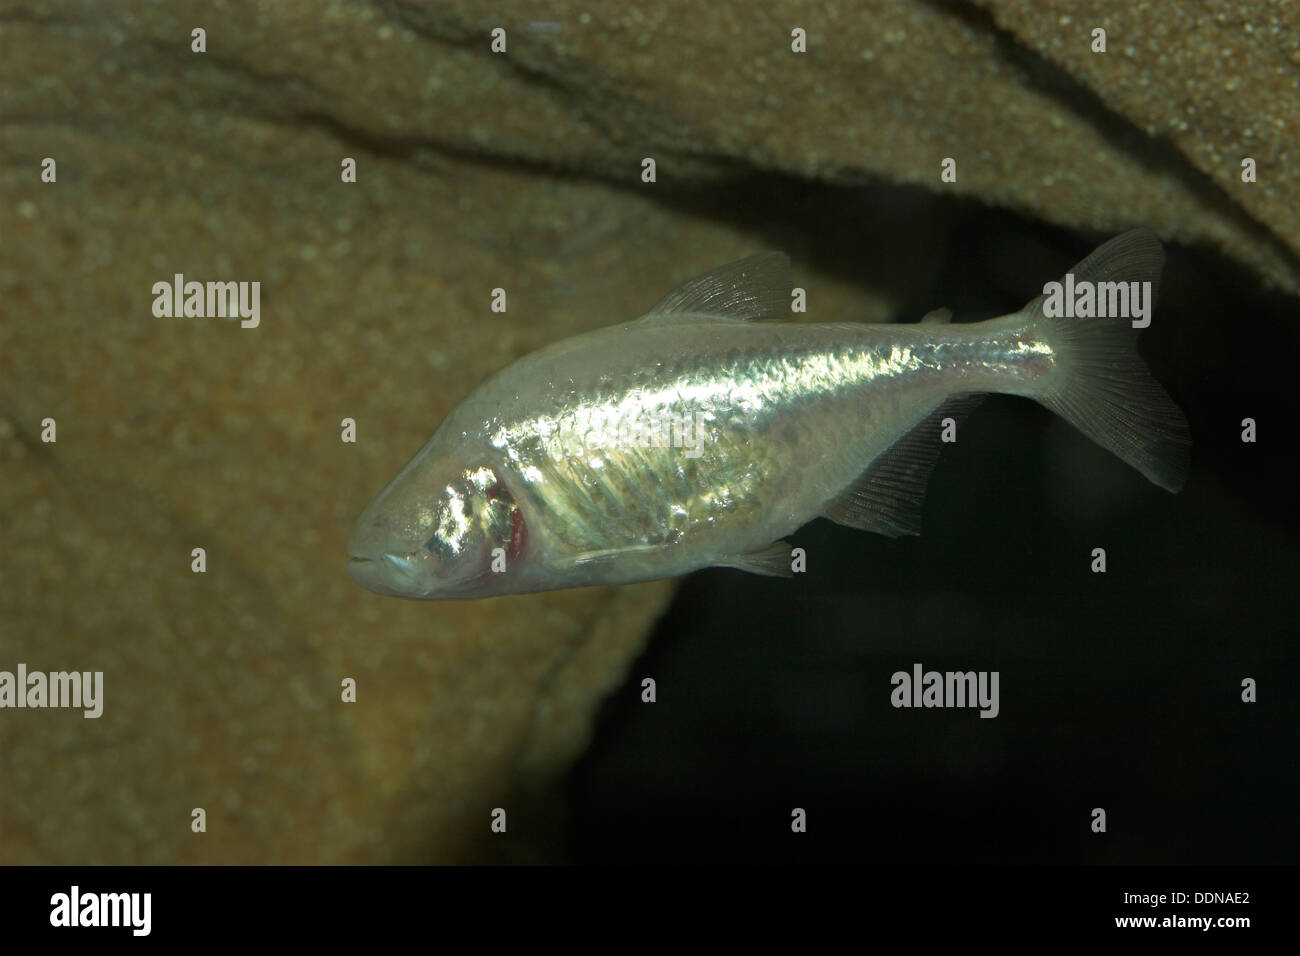 Blind cavefish, Blinder Höhlensalmler, Astyanax mexicanus, Astyanax fasciatus mexicanus, Anoptichthys jordani, Höhlenfisch - Stock Image